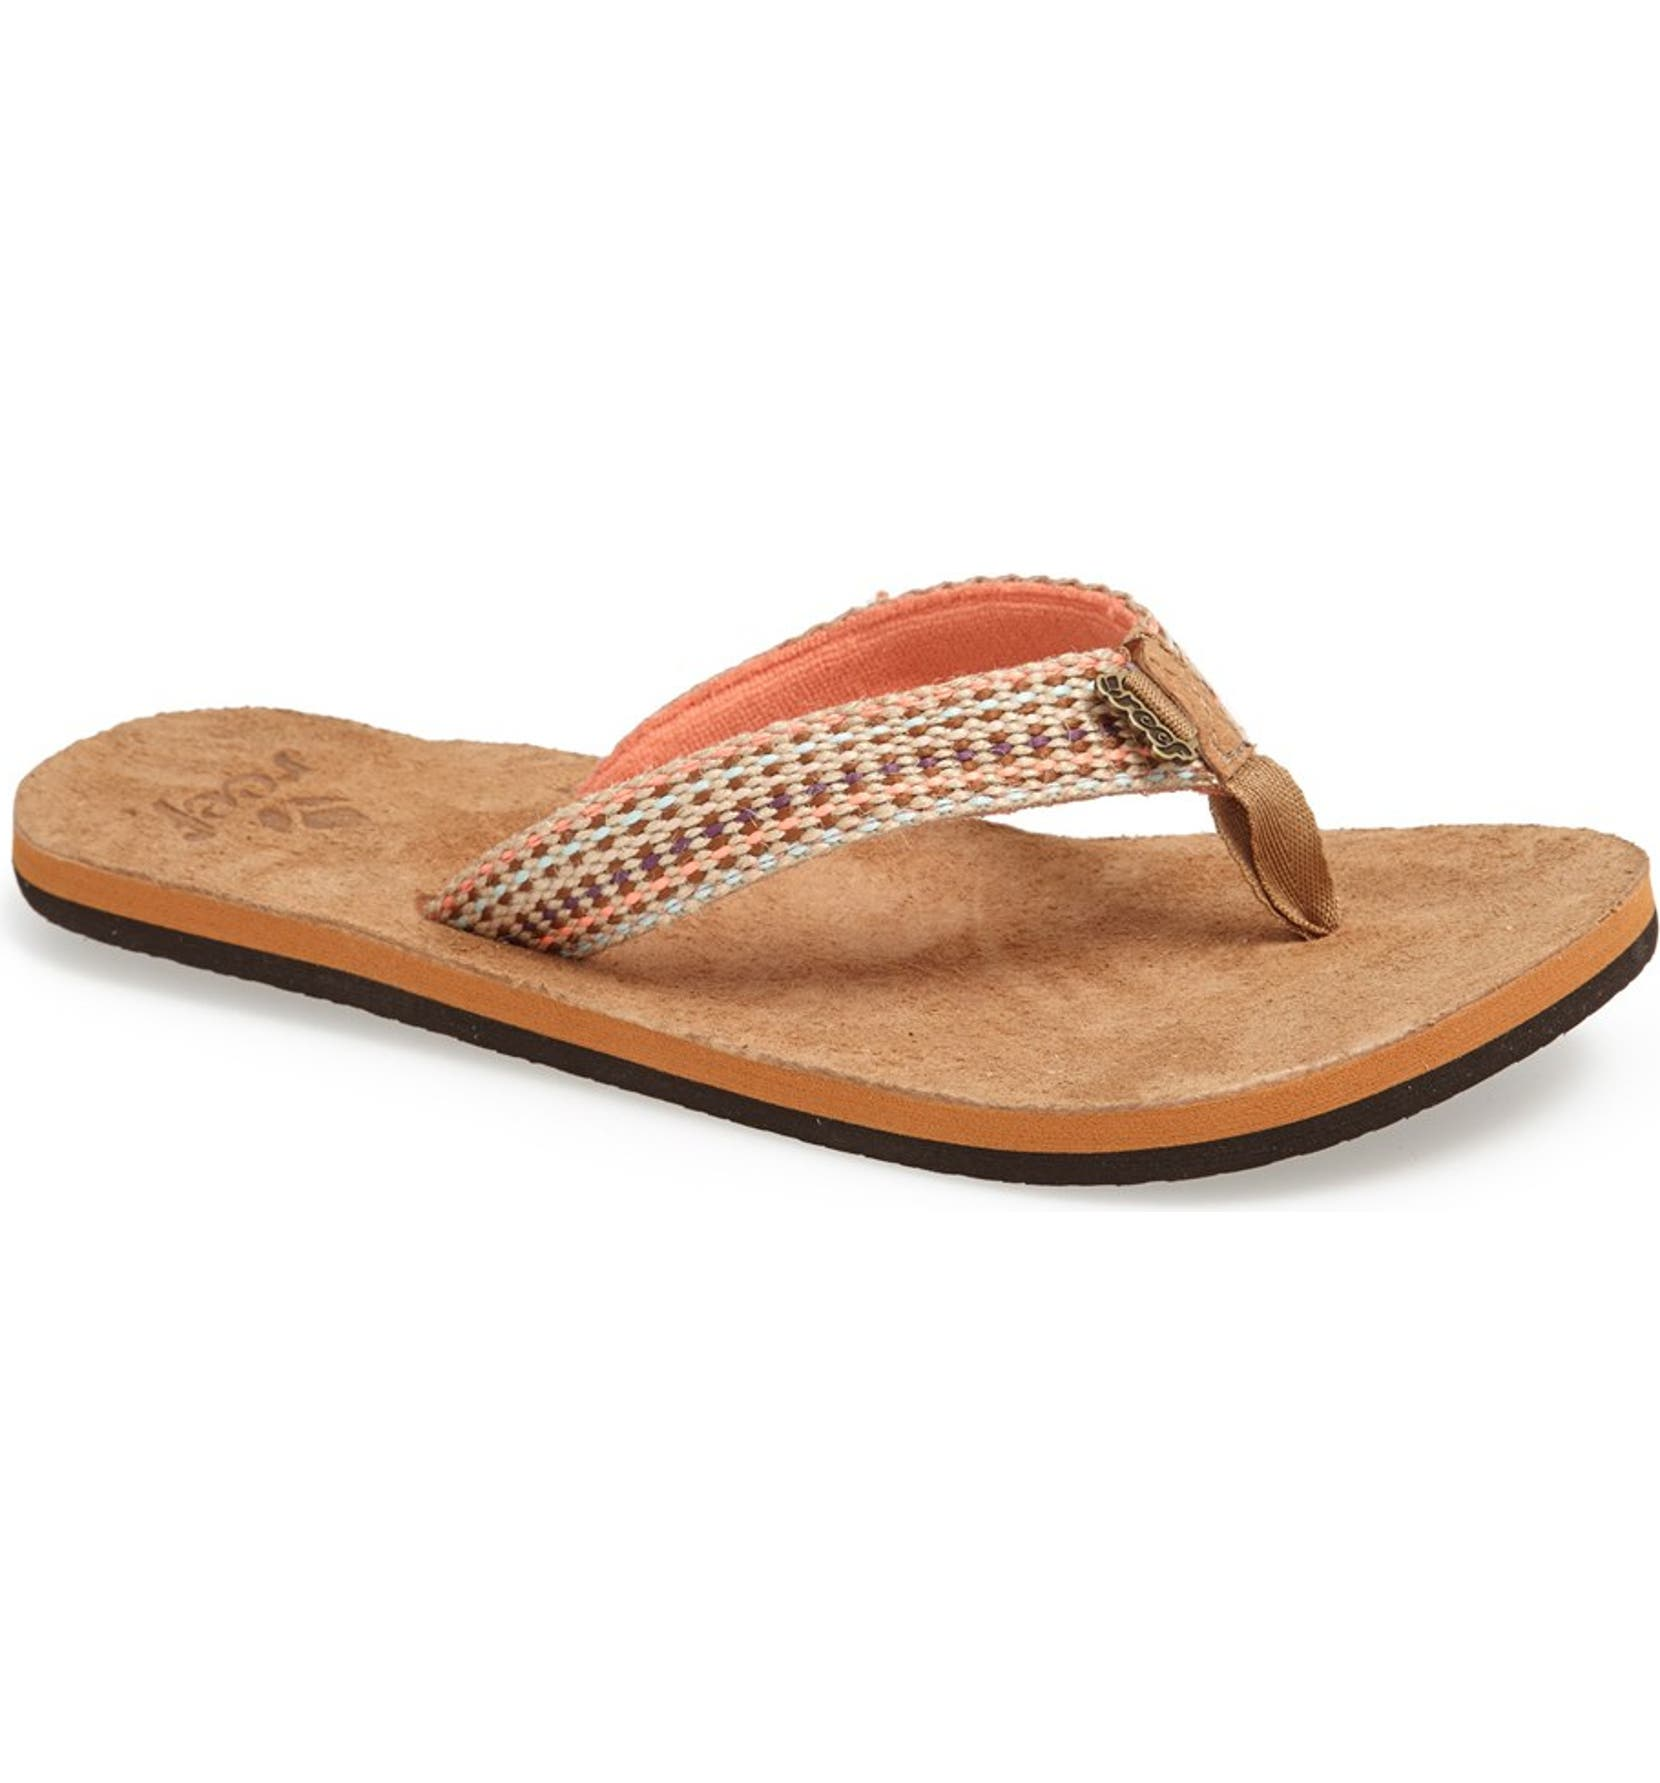 6abe1a1a8f53 Reef  Gypsylove  Flip Flop